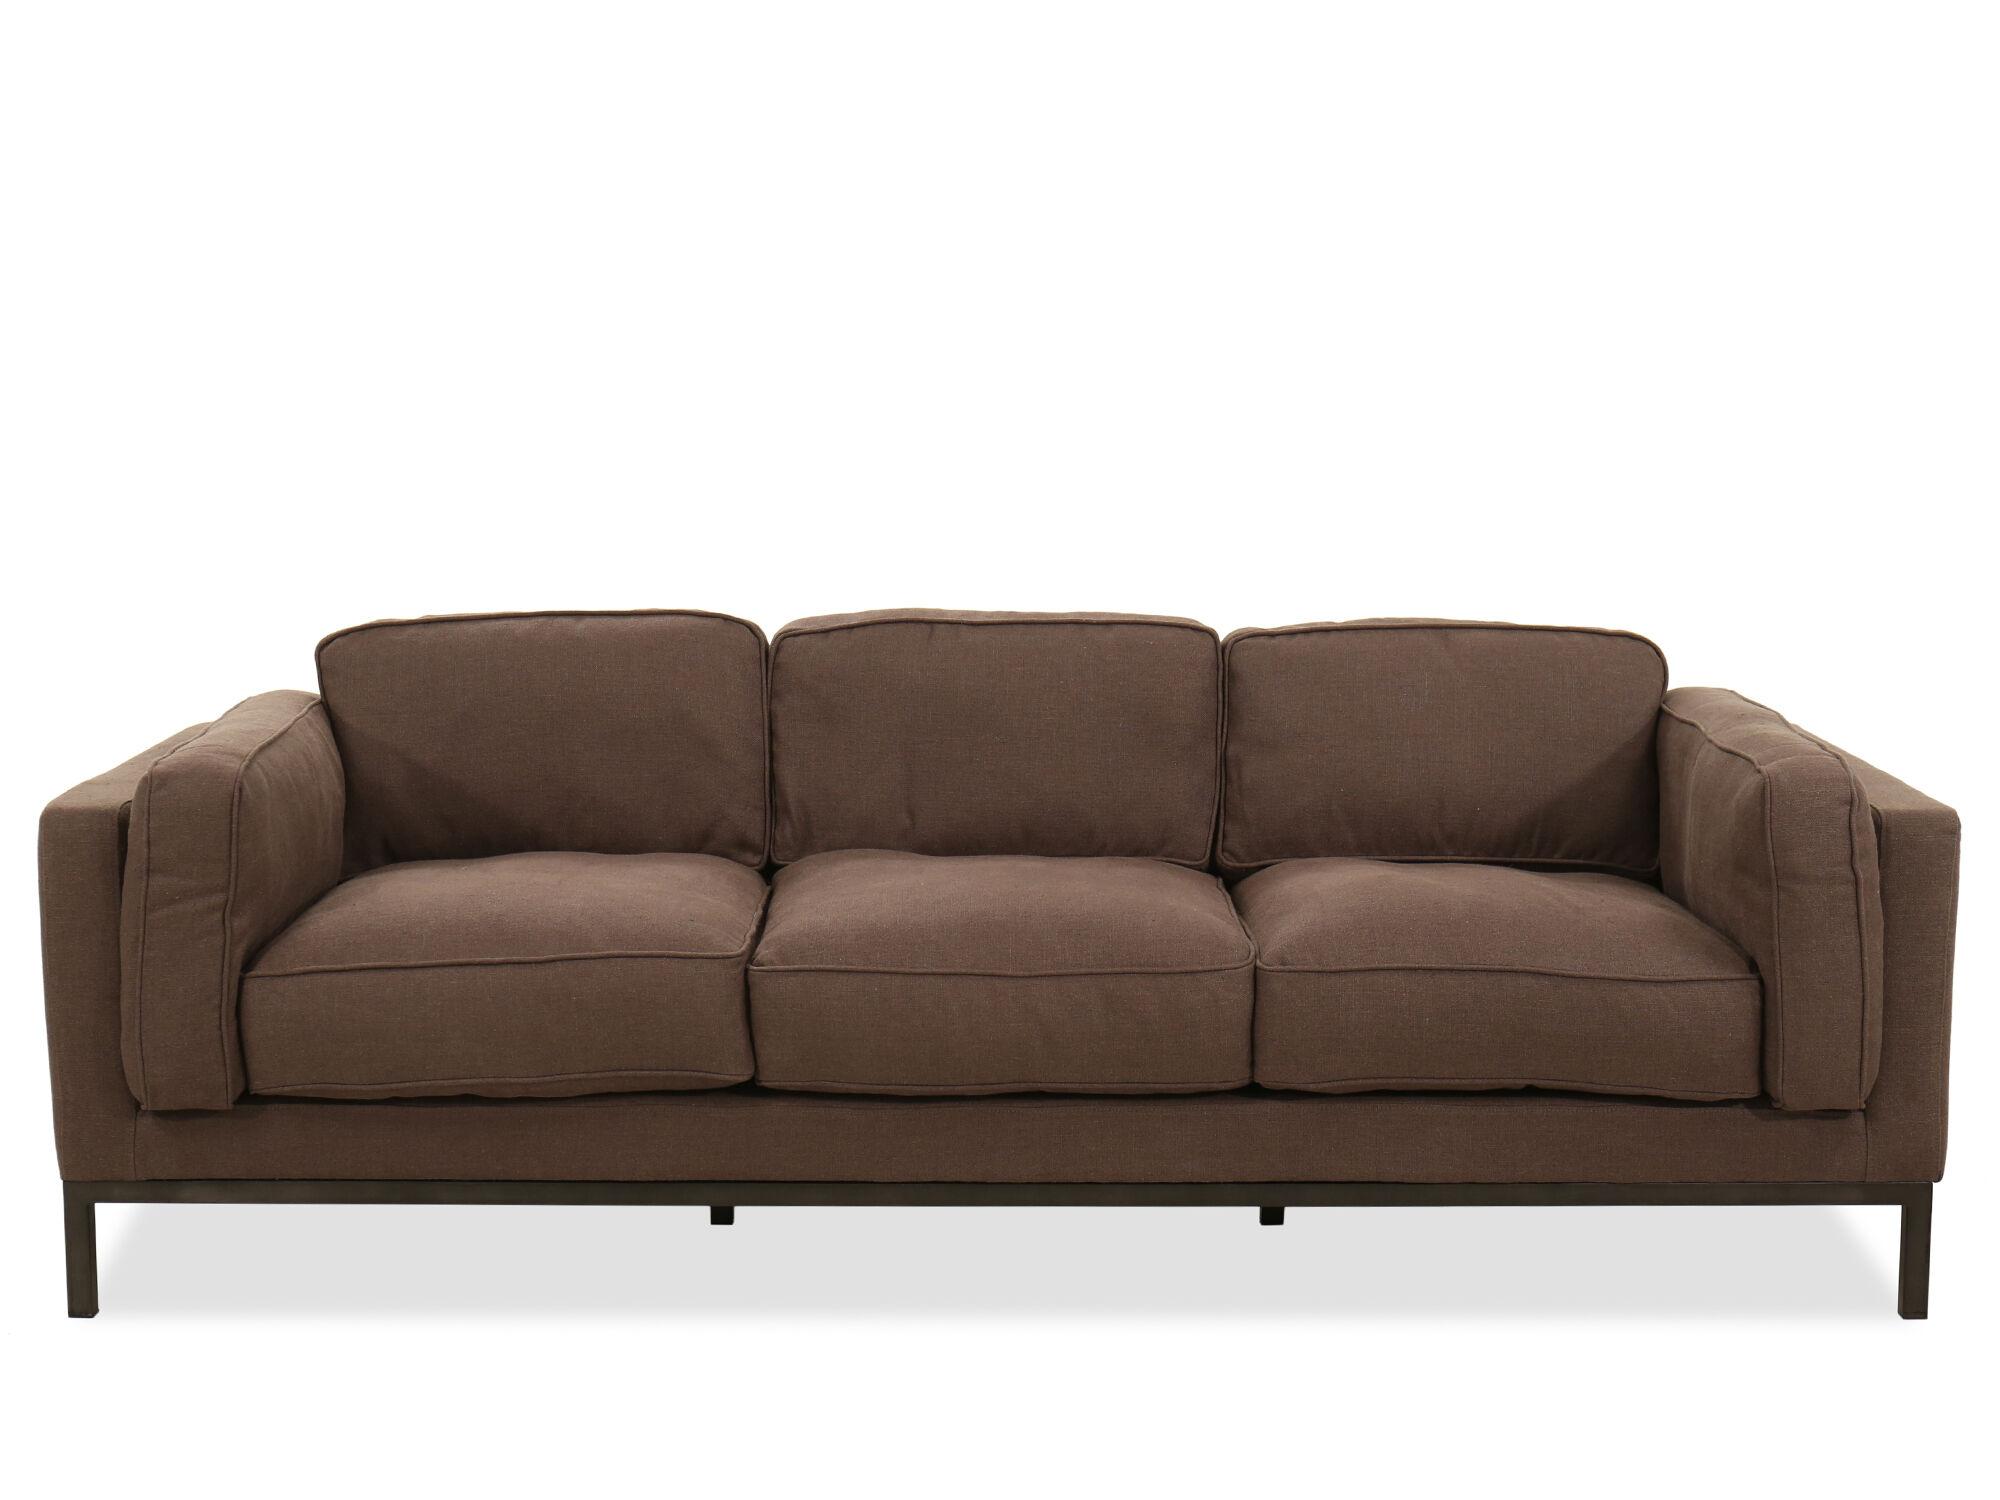 low profile three seater sofa in brown